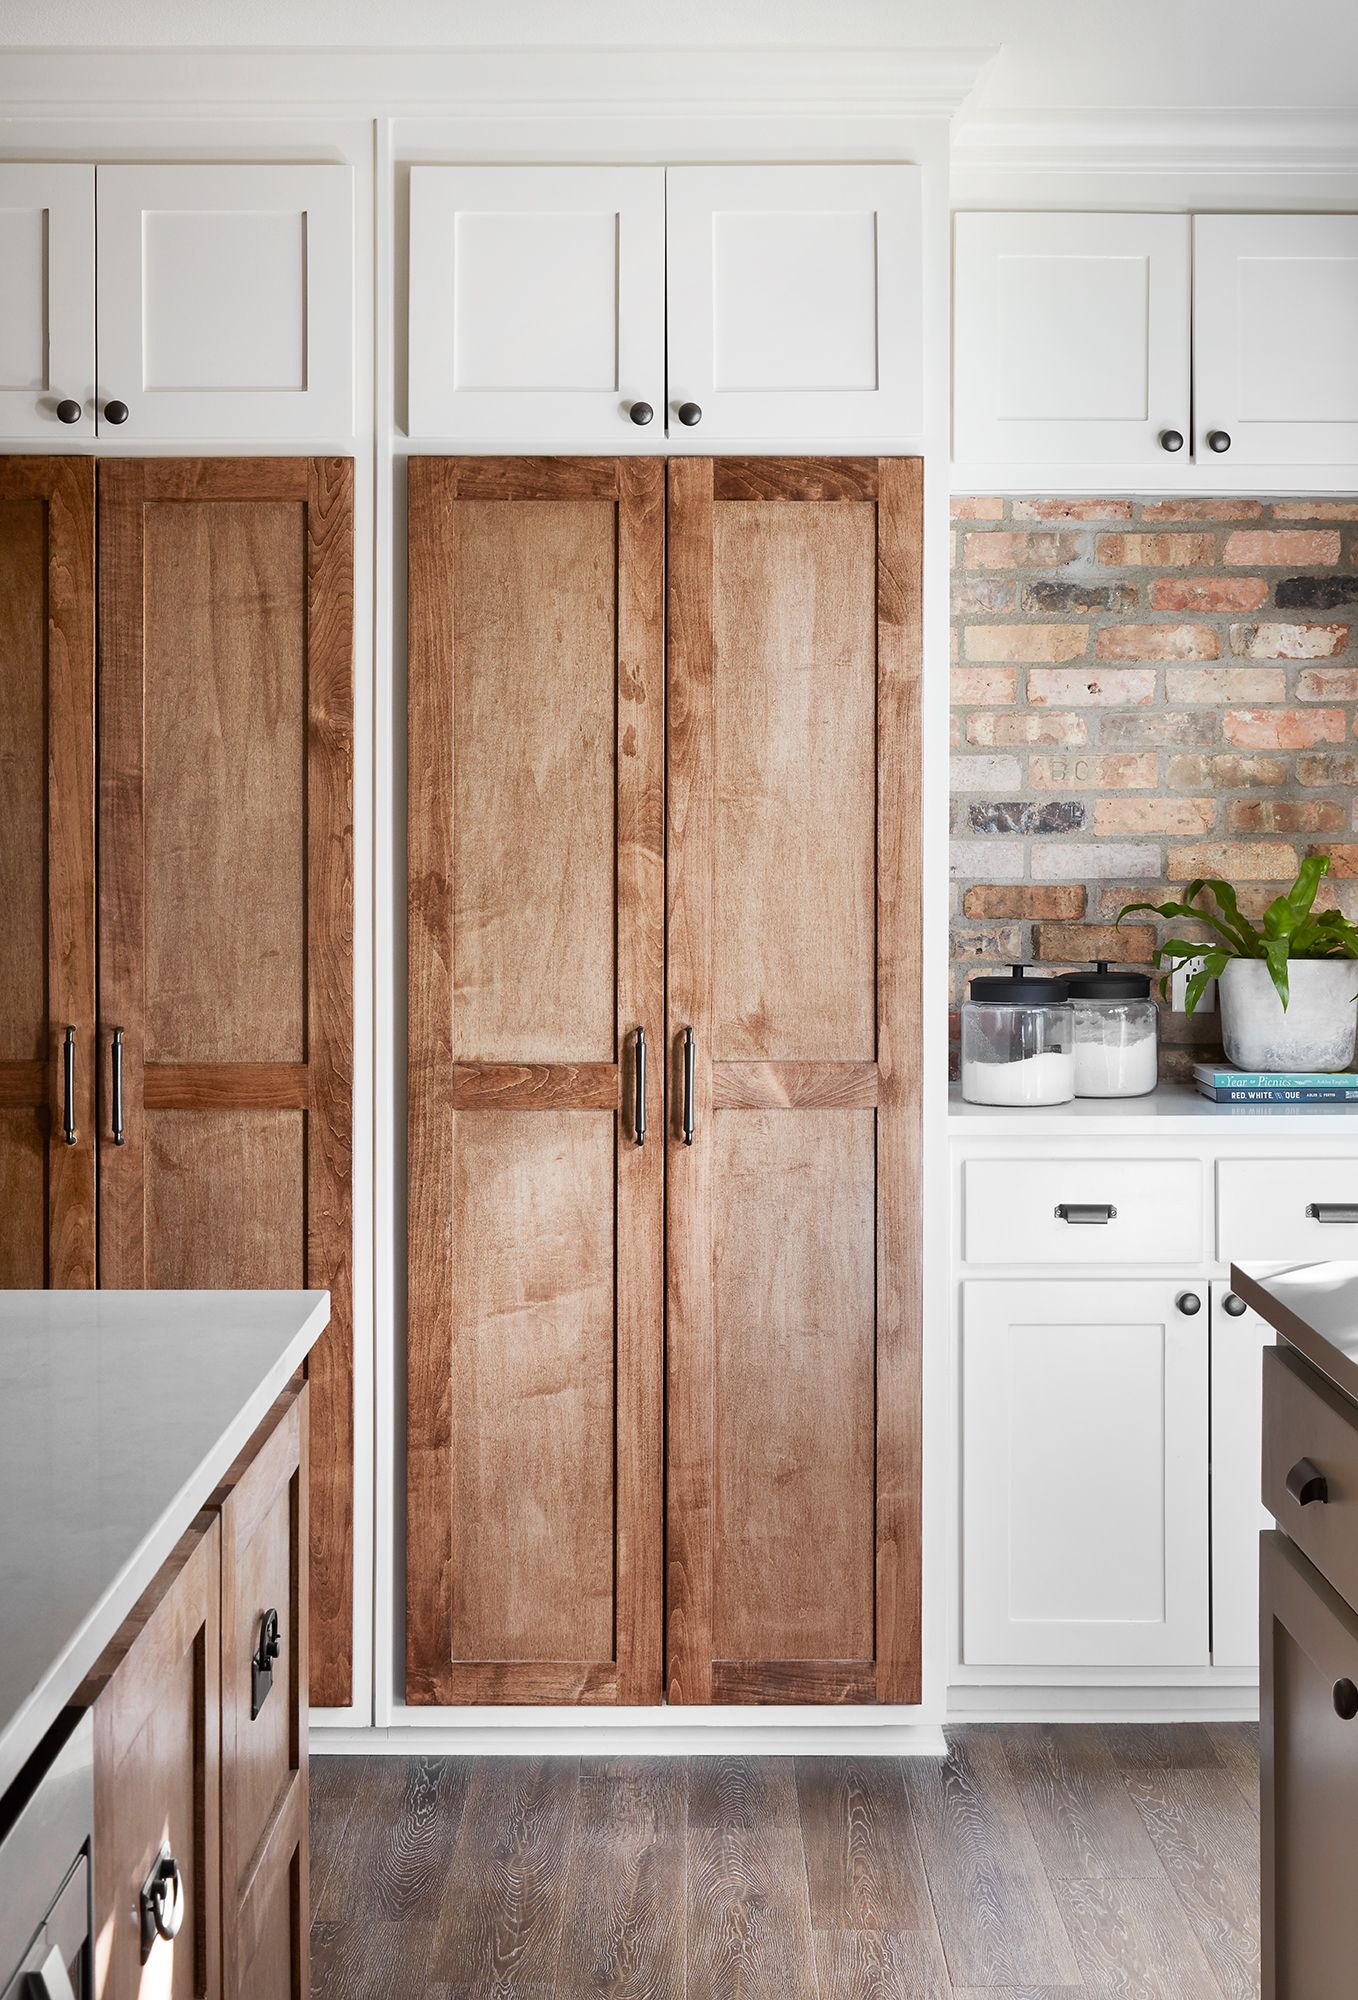 Episode 3 Season 5 Hgtv S Fixer Upper Chip Jo Gaines Luxury Kitchens Kitchen Design Fixer Upper Kitchen